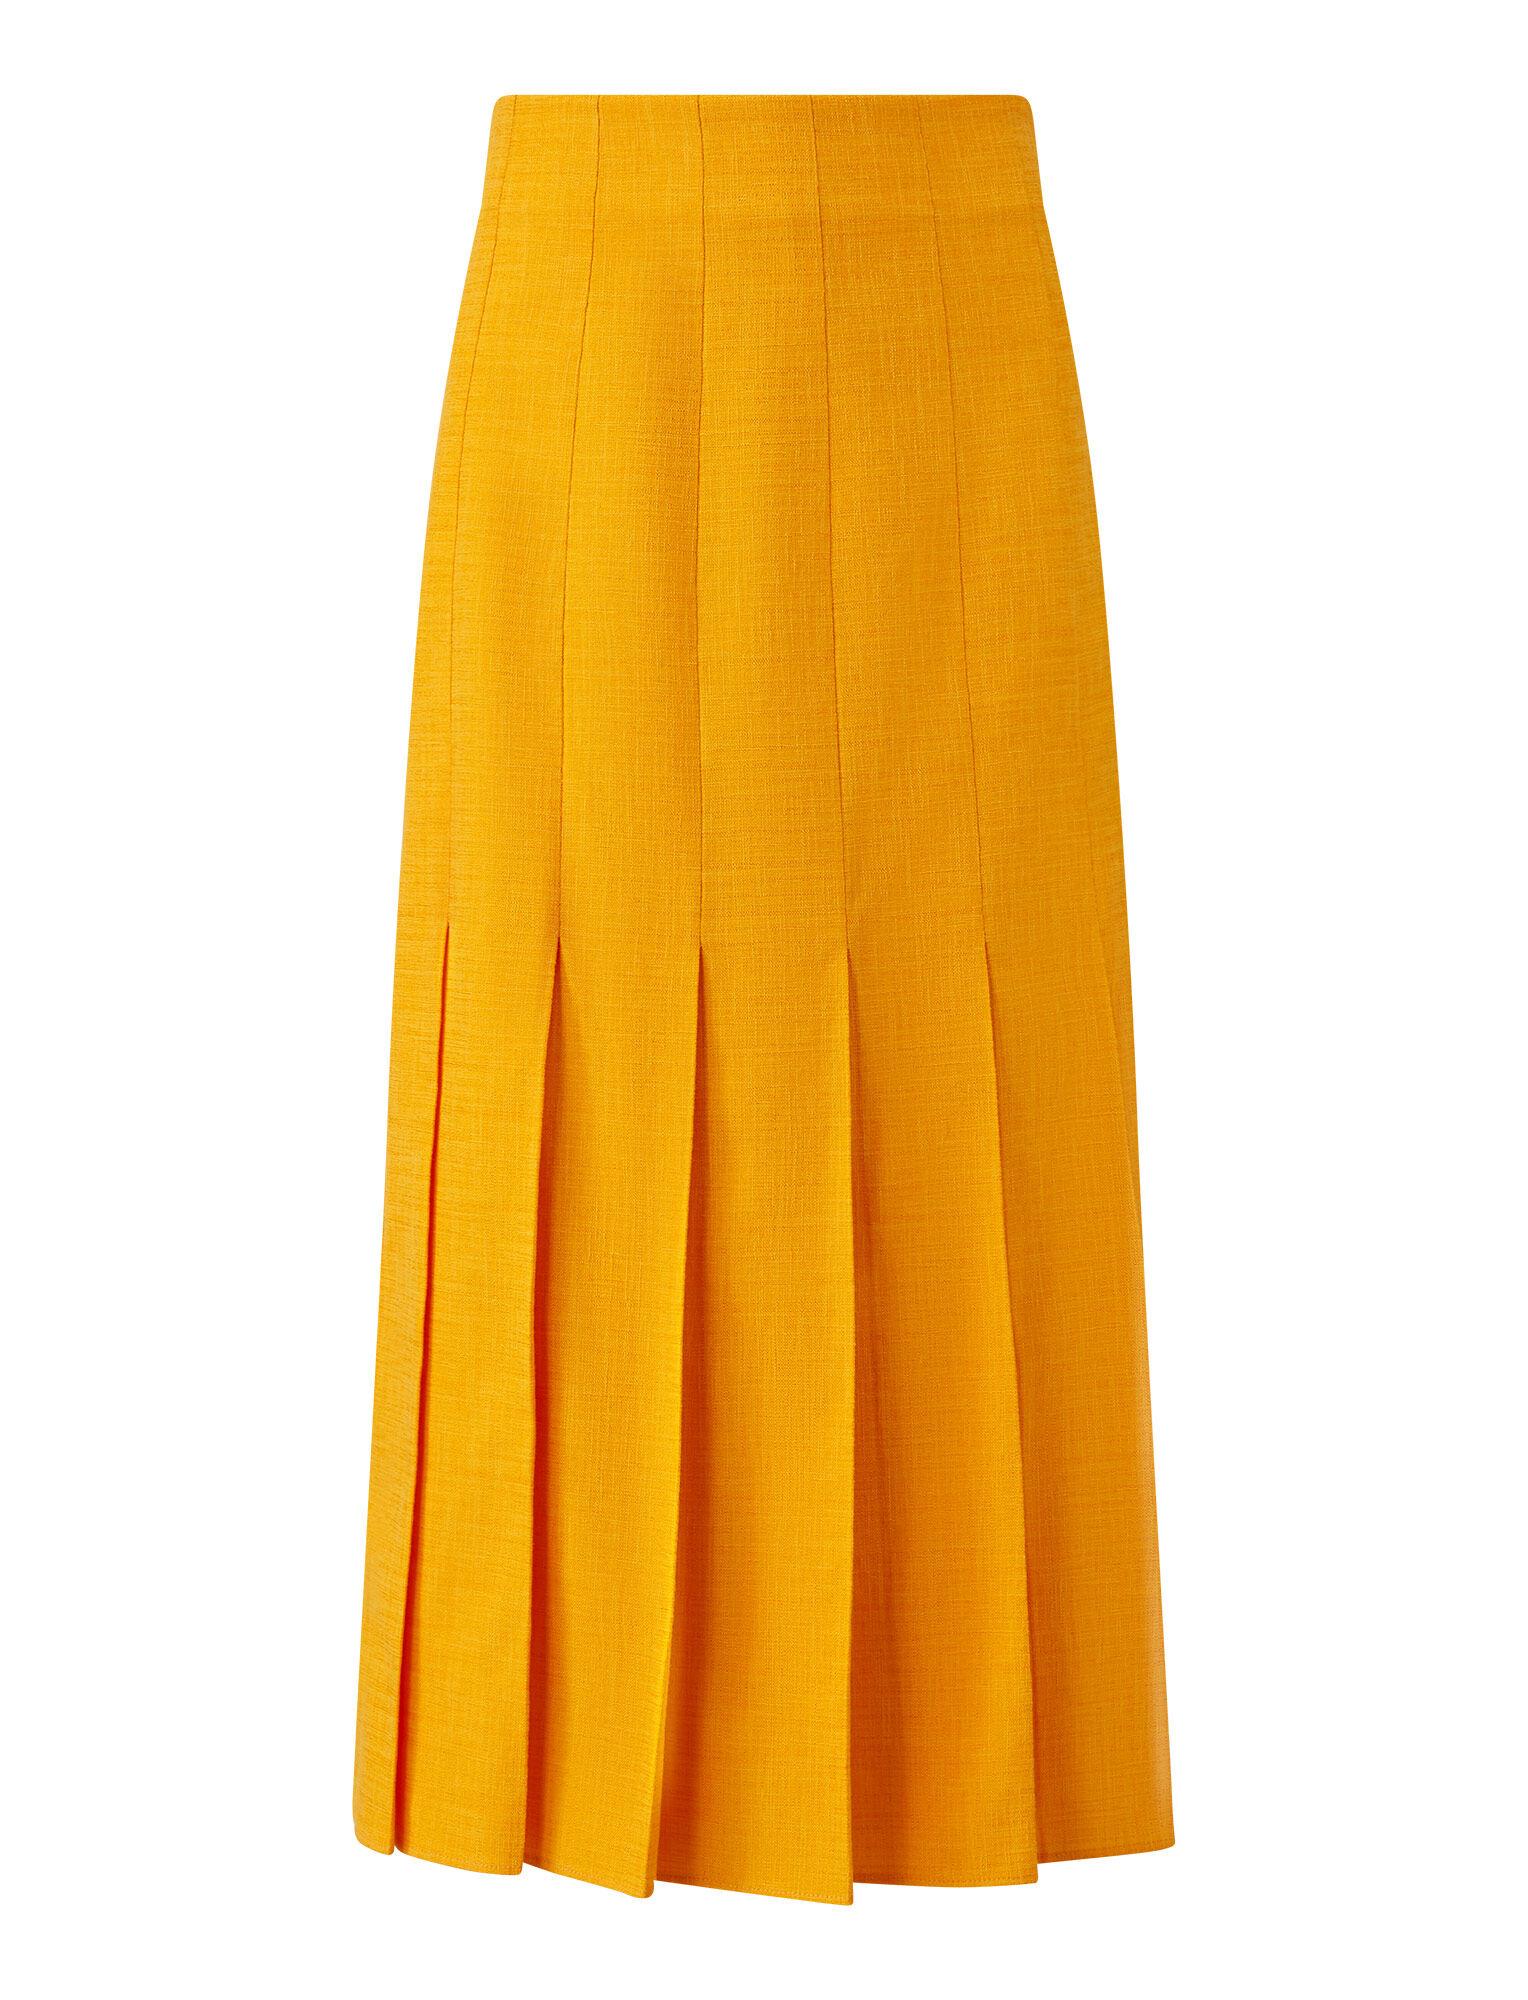 Joseph, Saari Shantung Linen Skirt, in TANGERINE